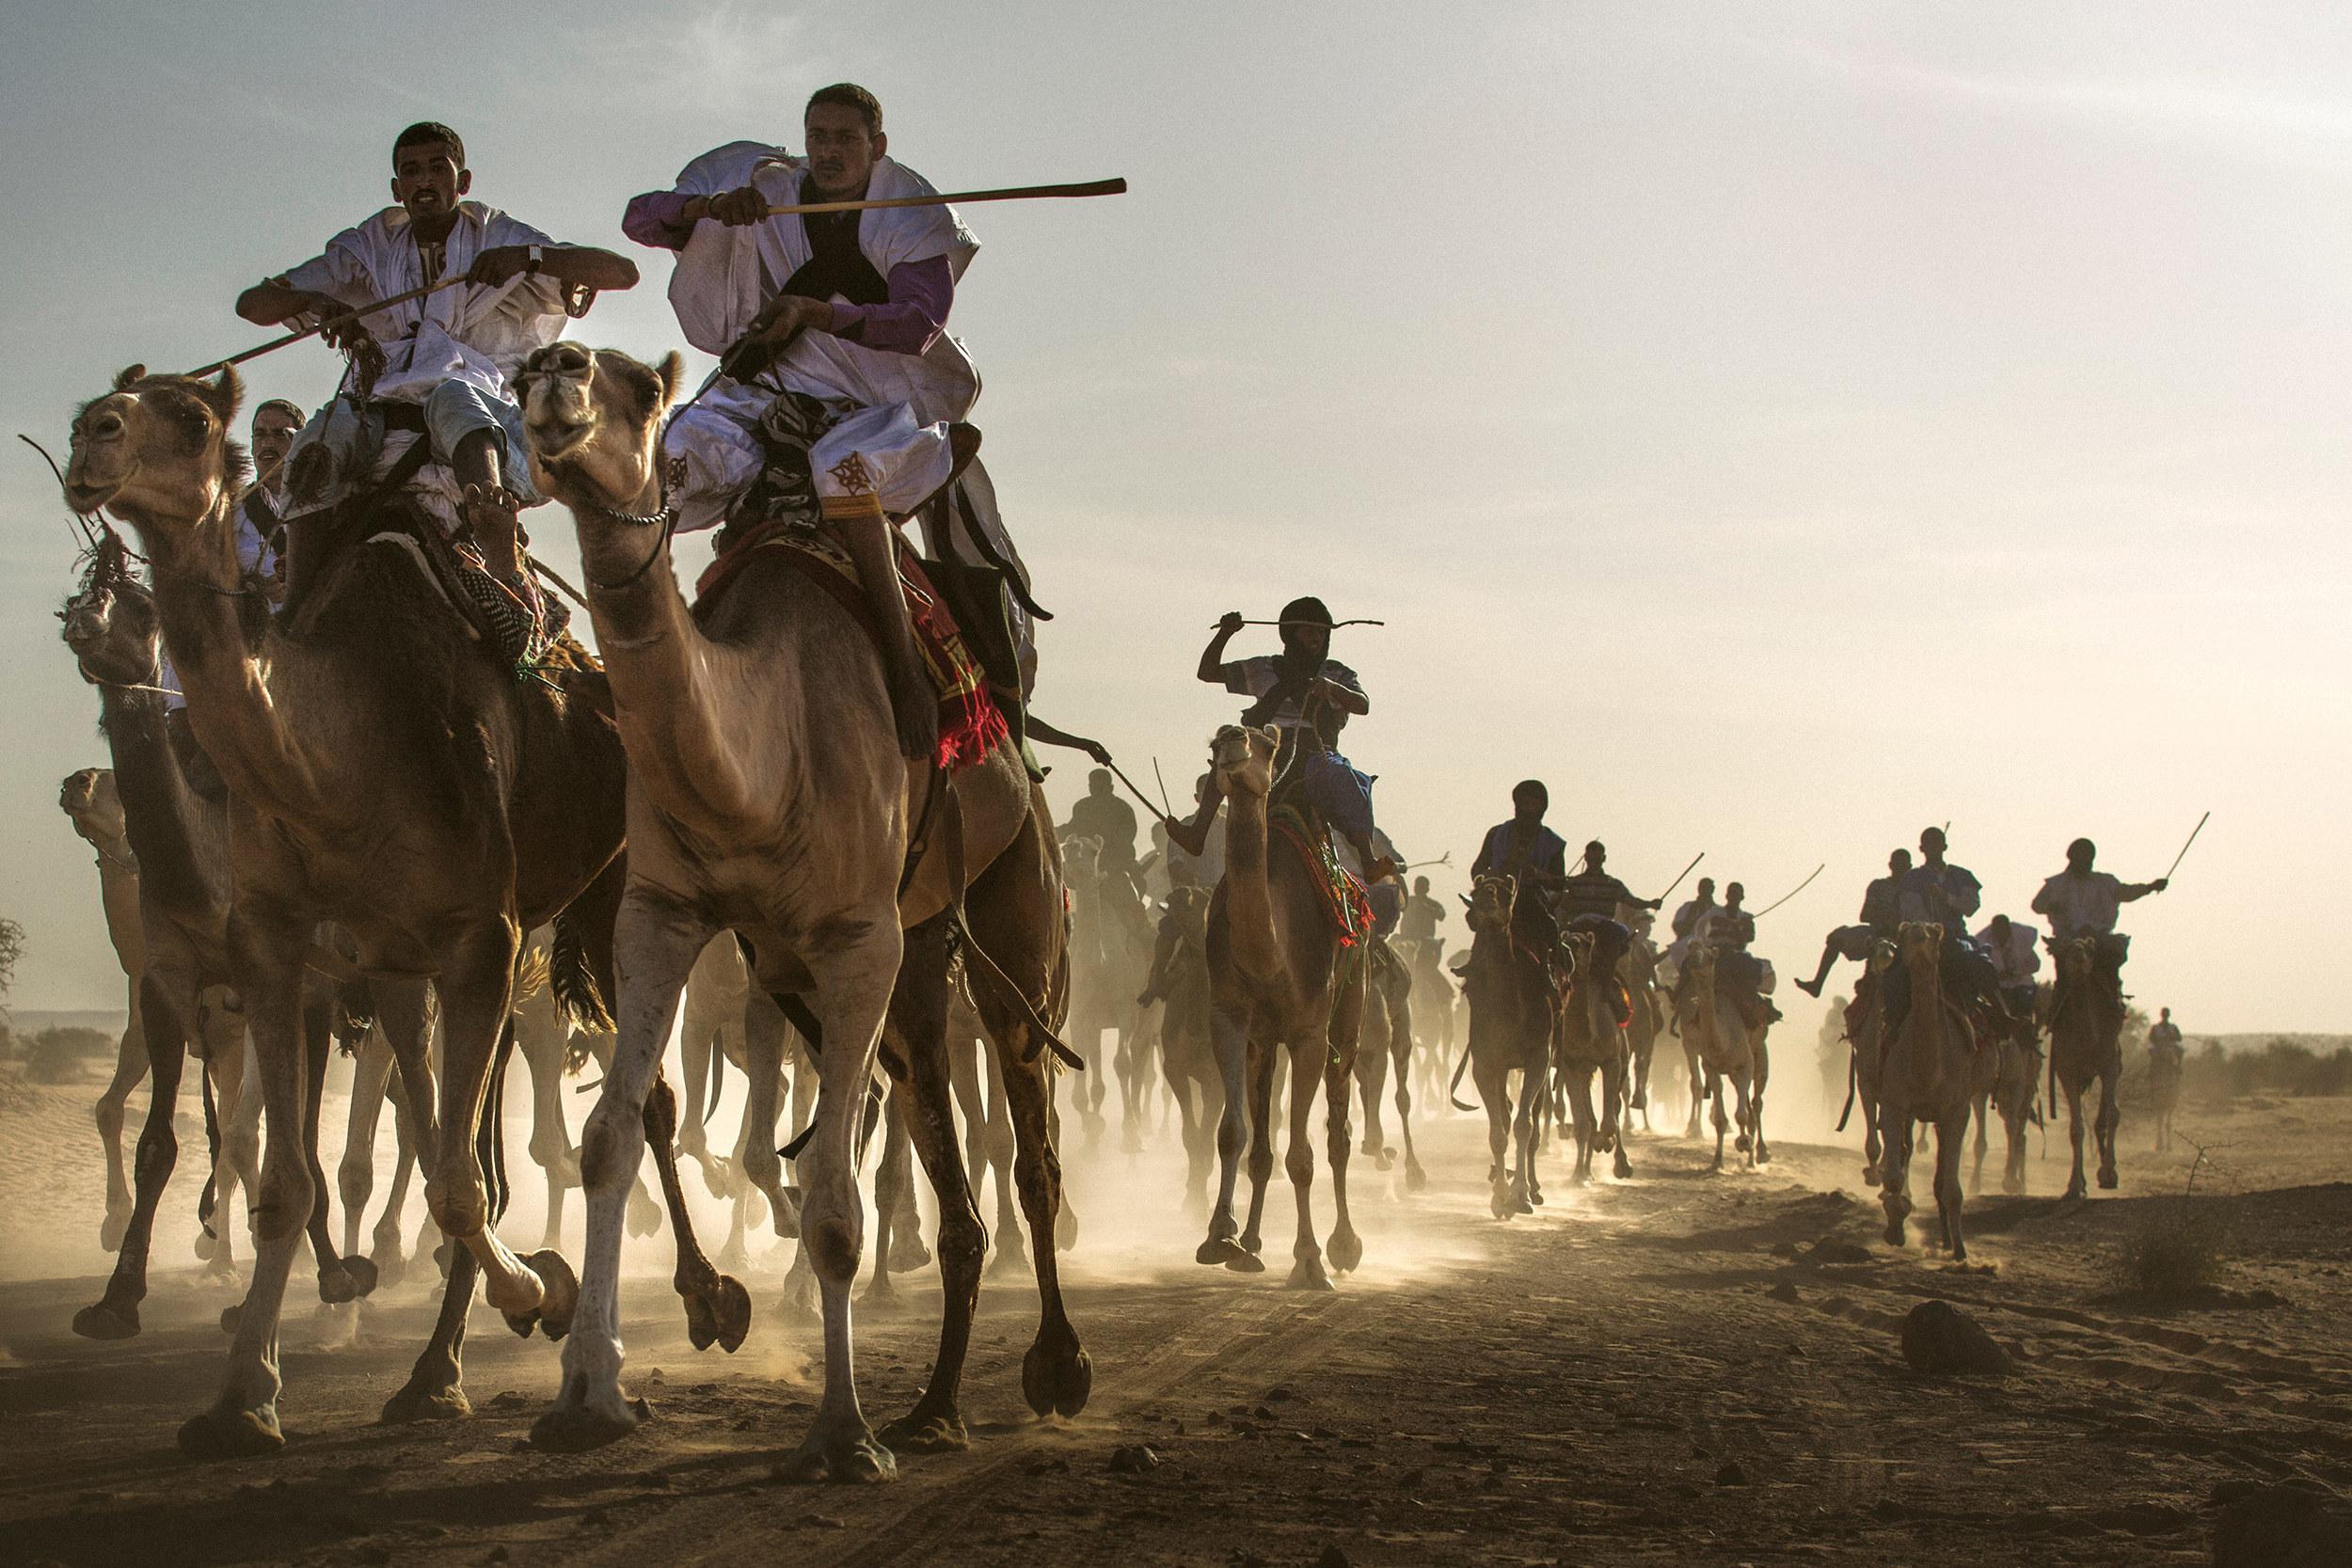 Camel race gets intense